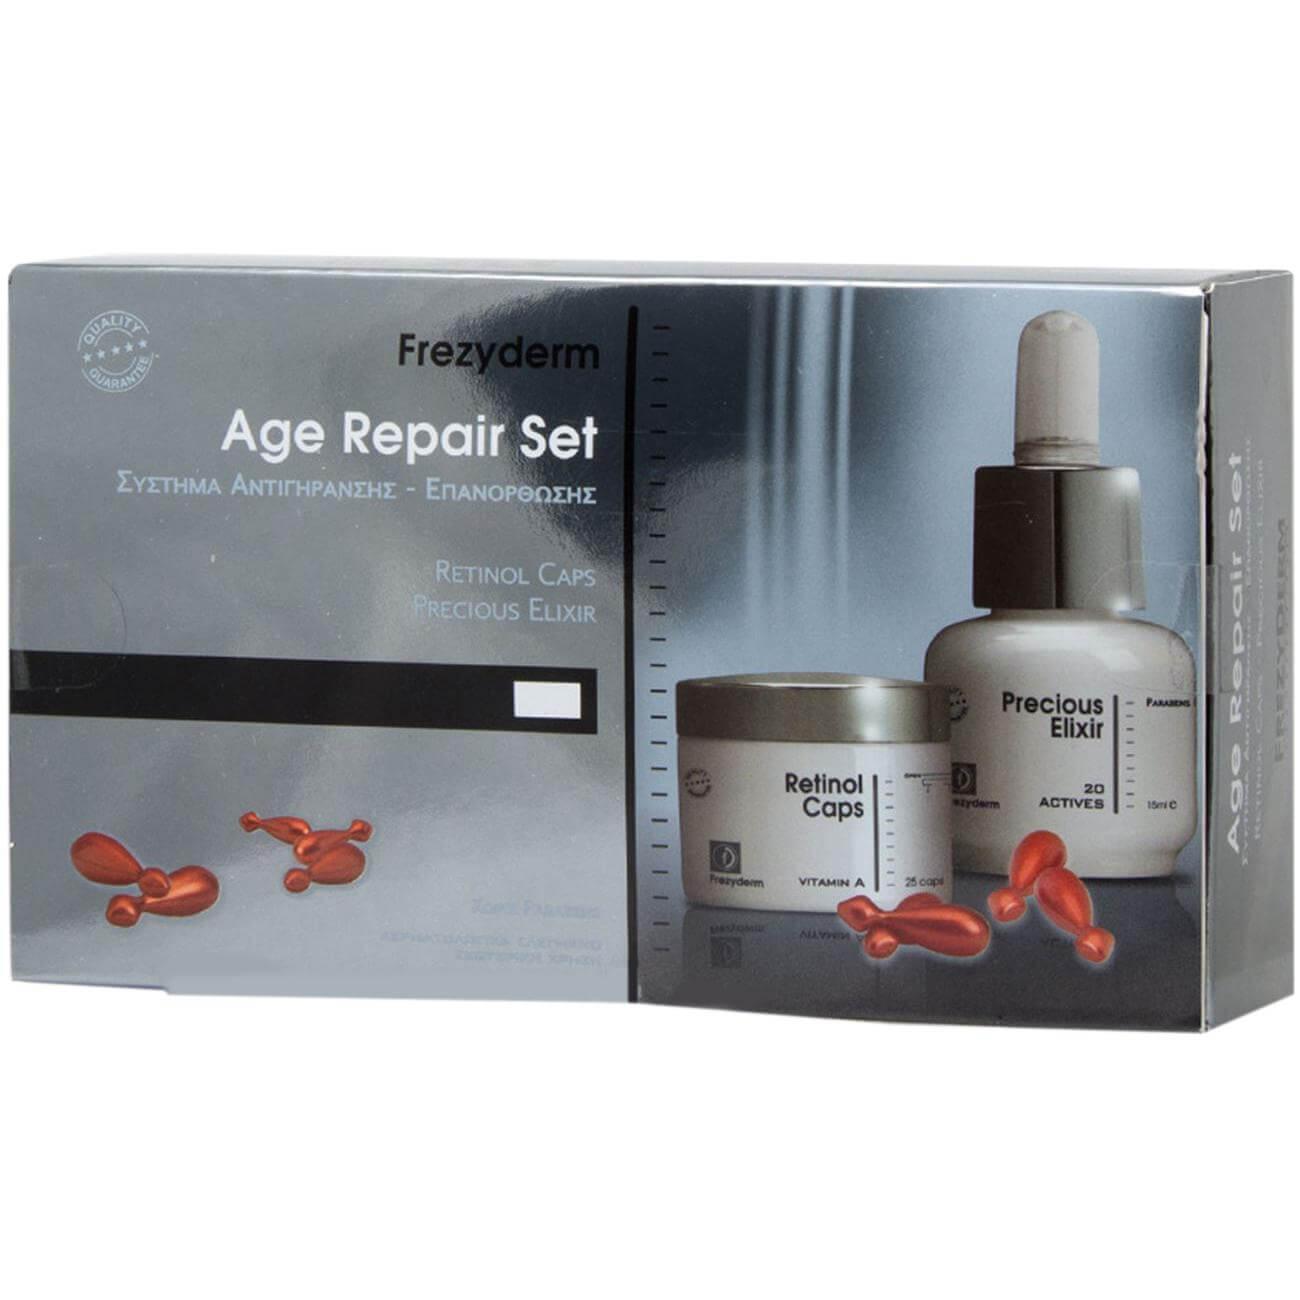 Frezyderm AgeRepair Set Σύστημα Αντιγήρανσης & Επανόρθωσης της Επιδερμίδας 15ml ομορφιά   αντιγήρανση και σύσφιξη προσώπου   serum αντιγήρανσης προσώπου